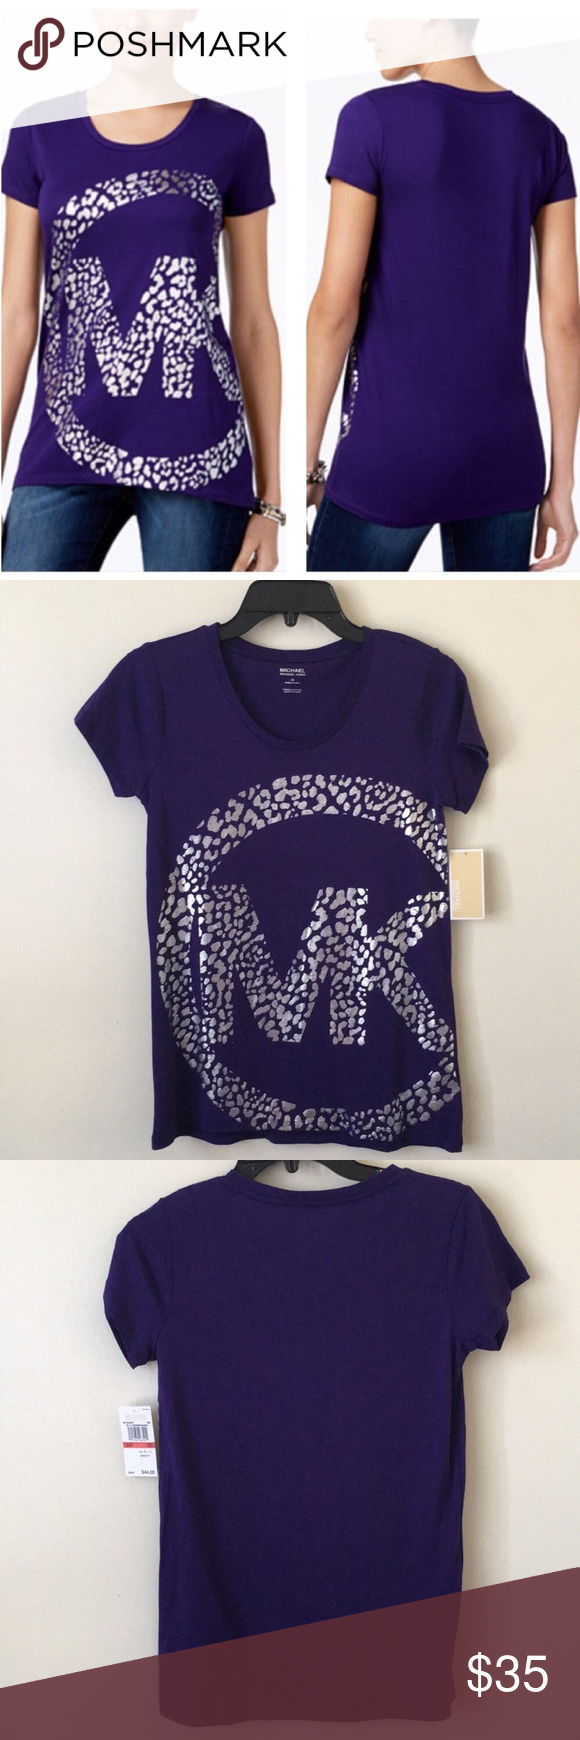 Michael Kors Purple Leopard Print Foil Logo Shirt Nwt Pinterest